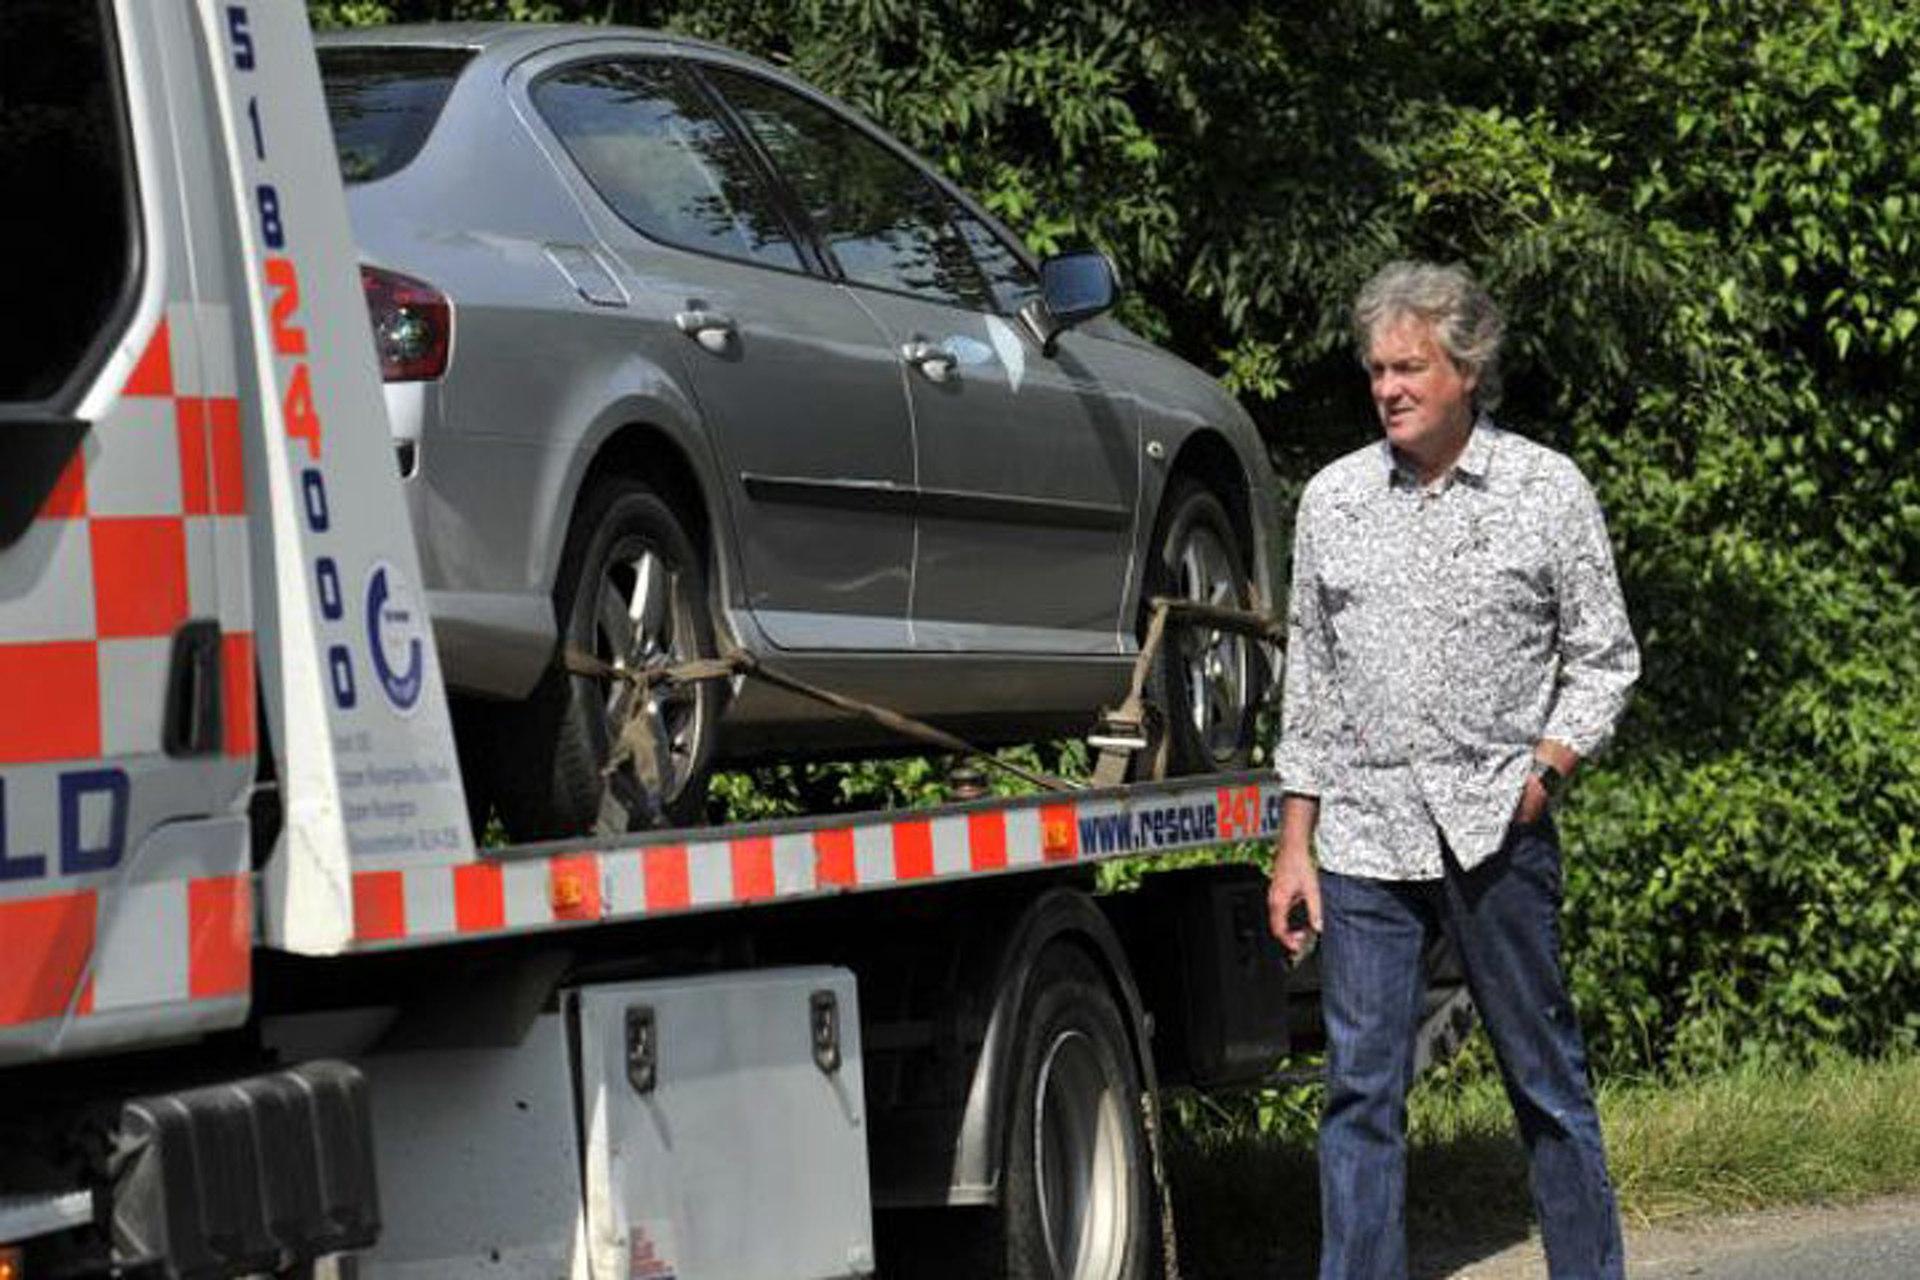 Top Gear Under Fire After Filming Near a Fatal Accident